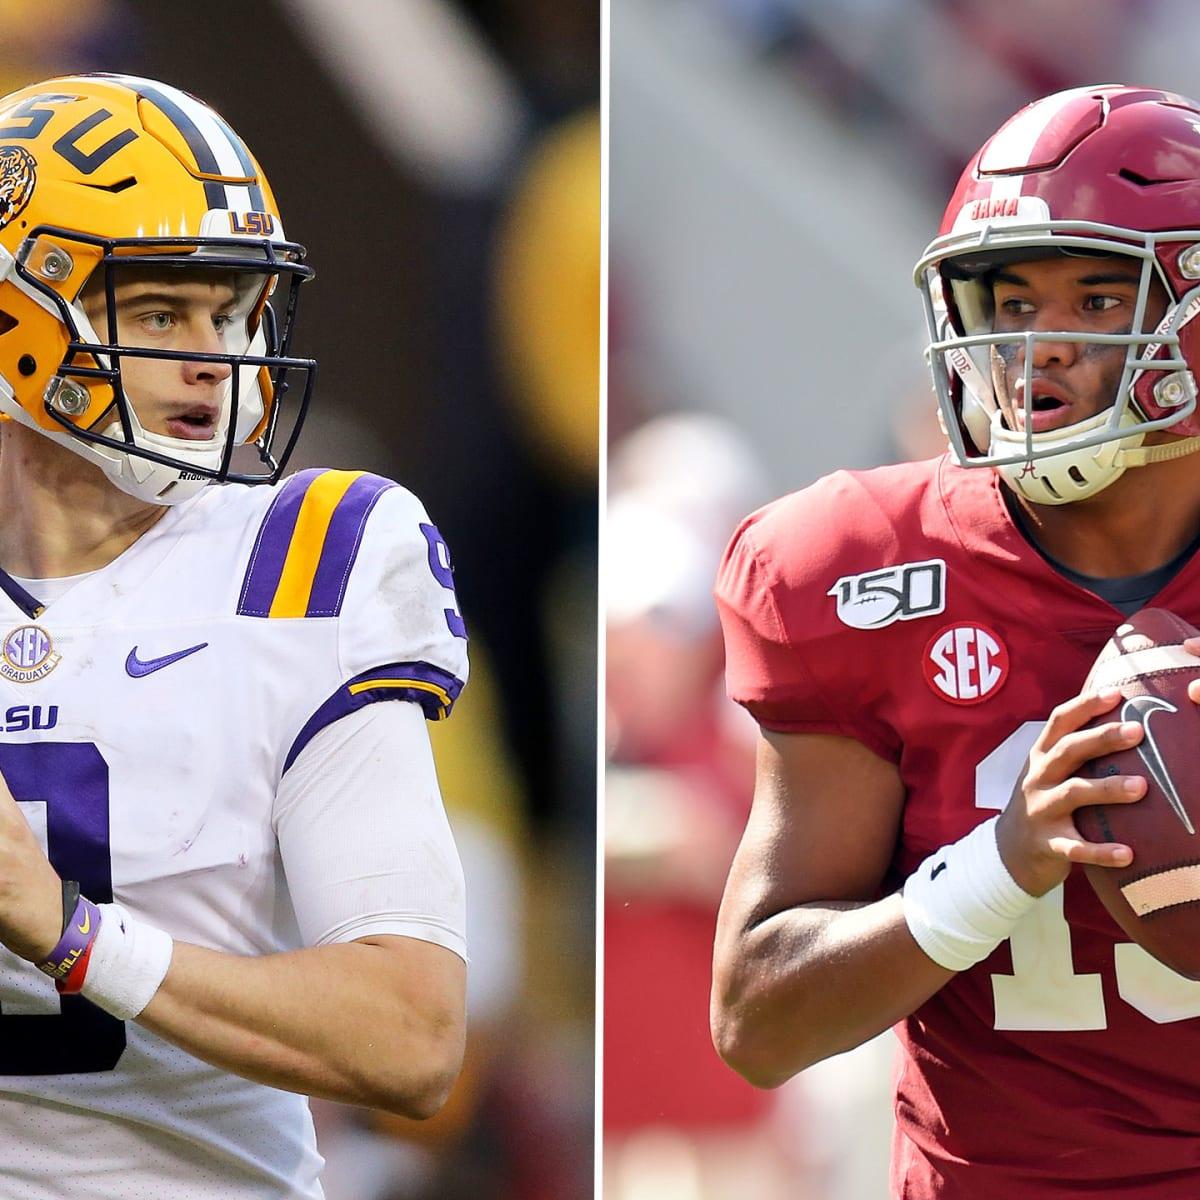 Alabama Vs Lsu Six Storylines Dominating College Football S Megaclash Sports Illustrated